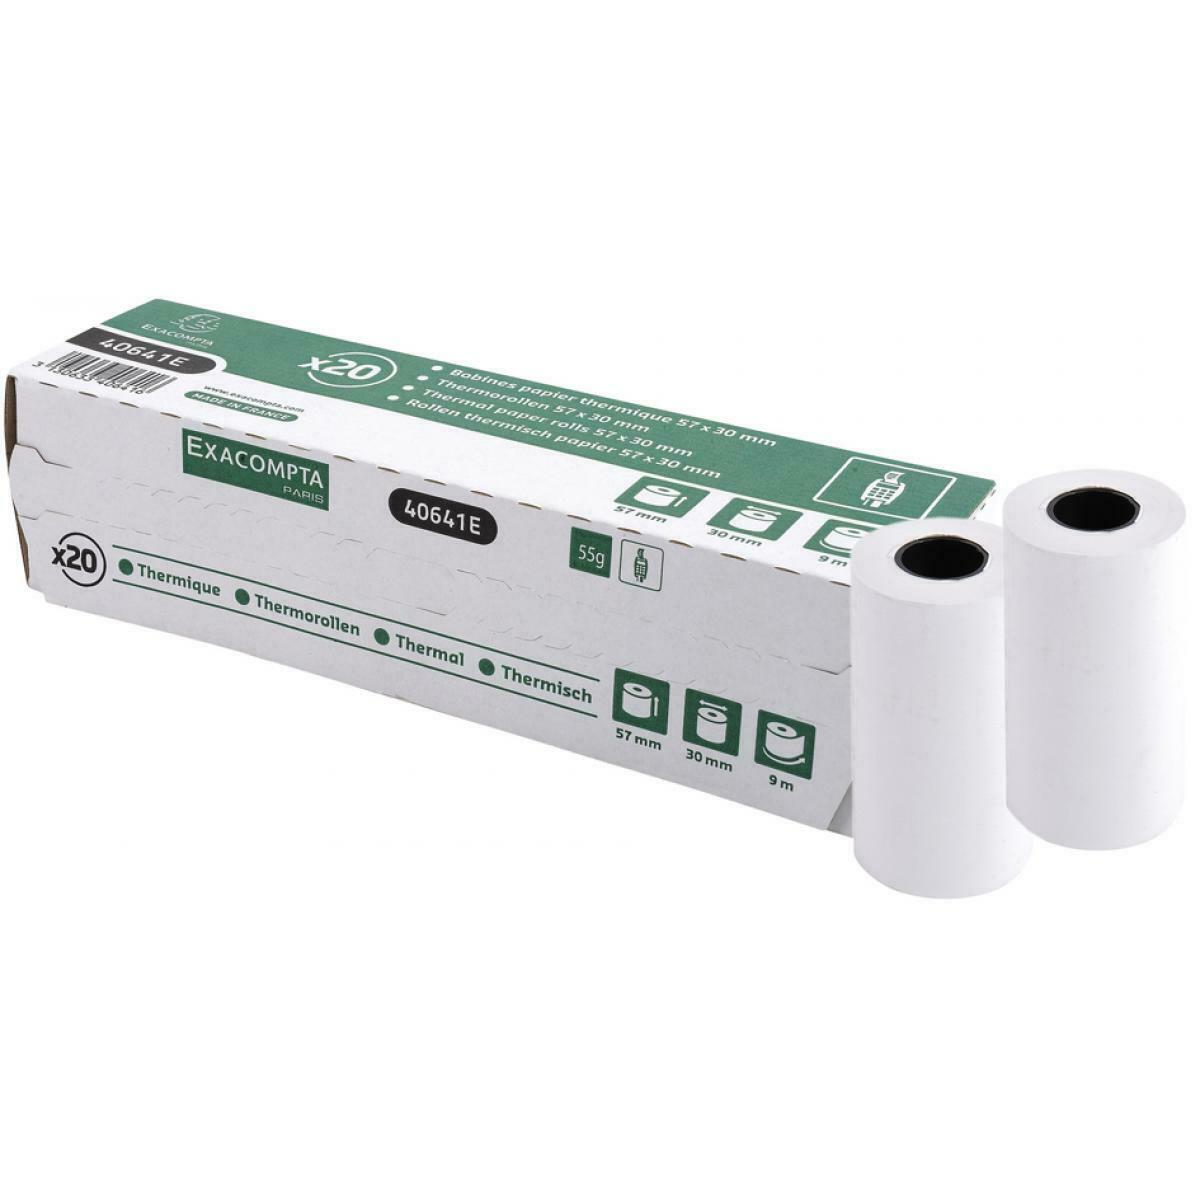 20x EXACOMPTA Thermorollen 1-lagig thermisch 55g/m² 57mm x 9m x 30mm - 40641E